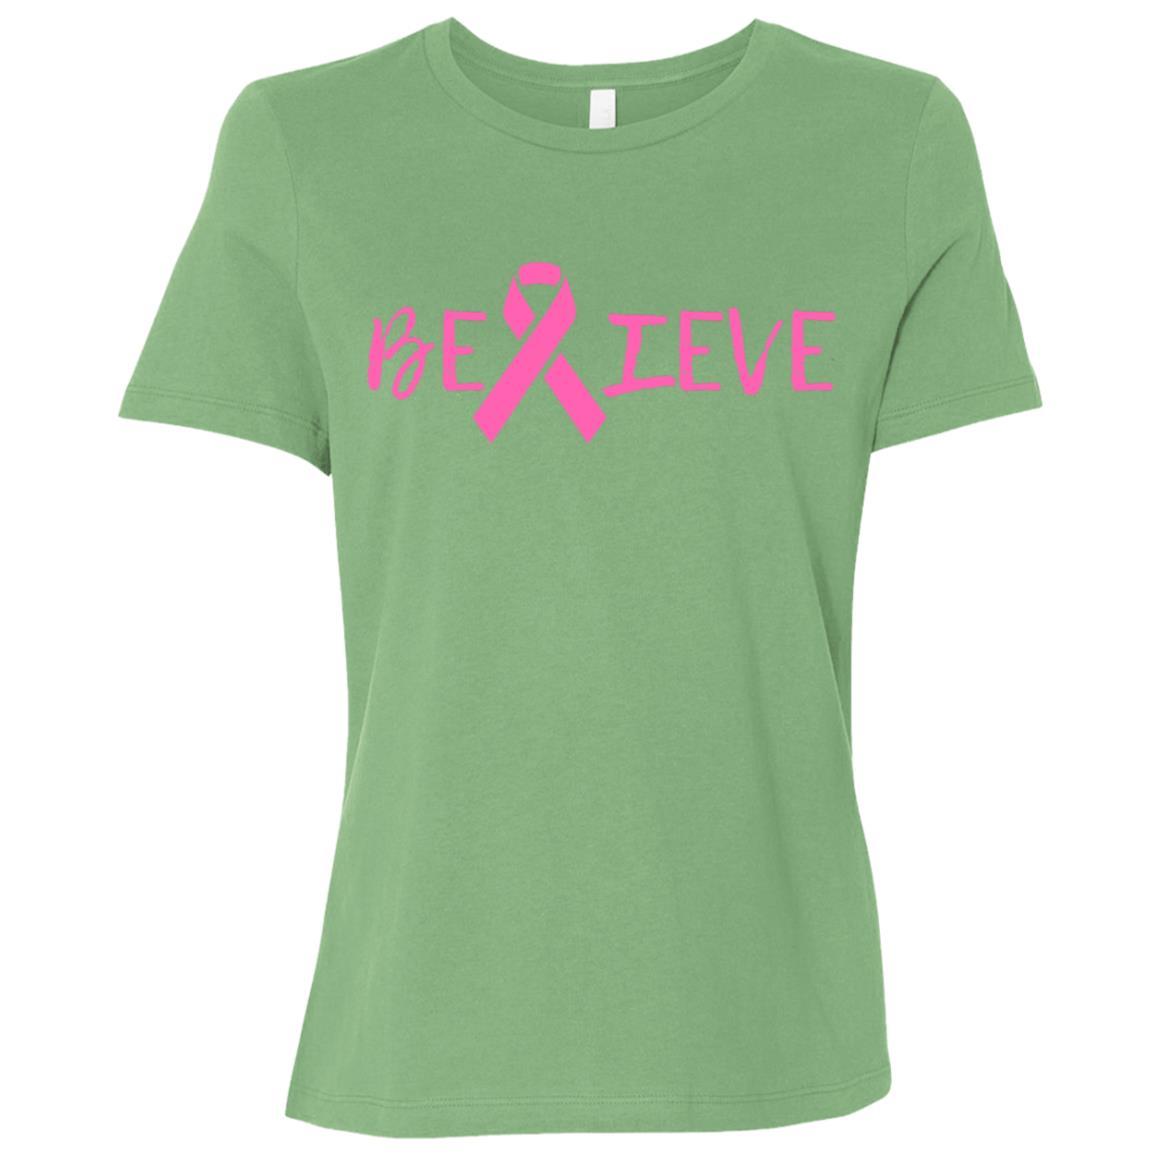 Summers Cancer - Believe Breast Cancer Women Short Sleeve T-Shirt